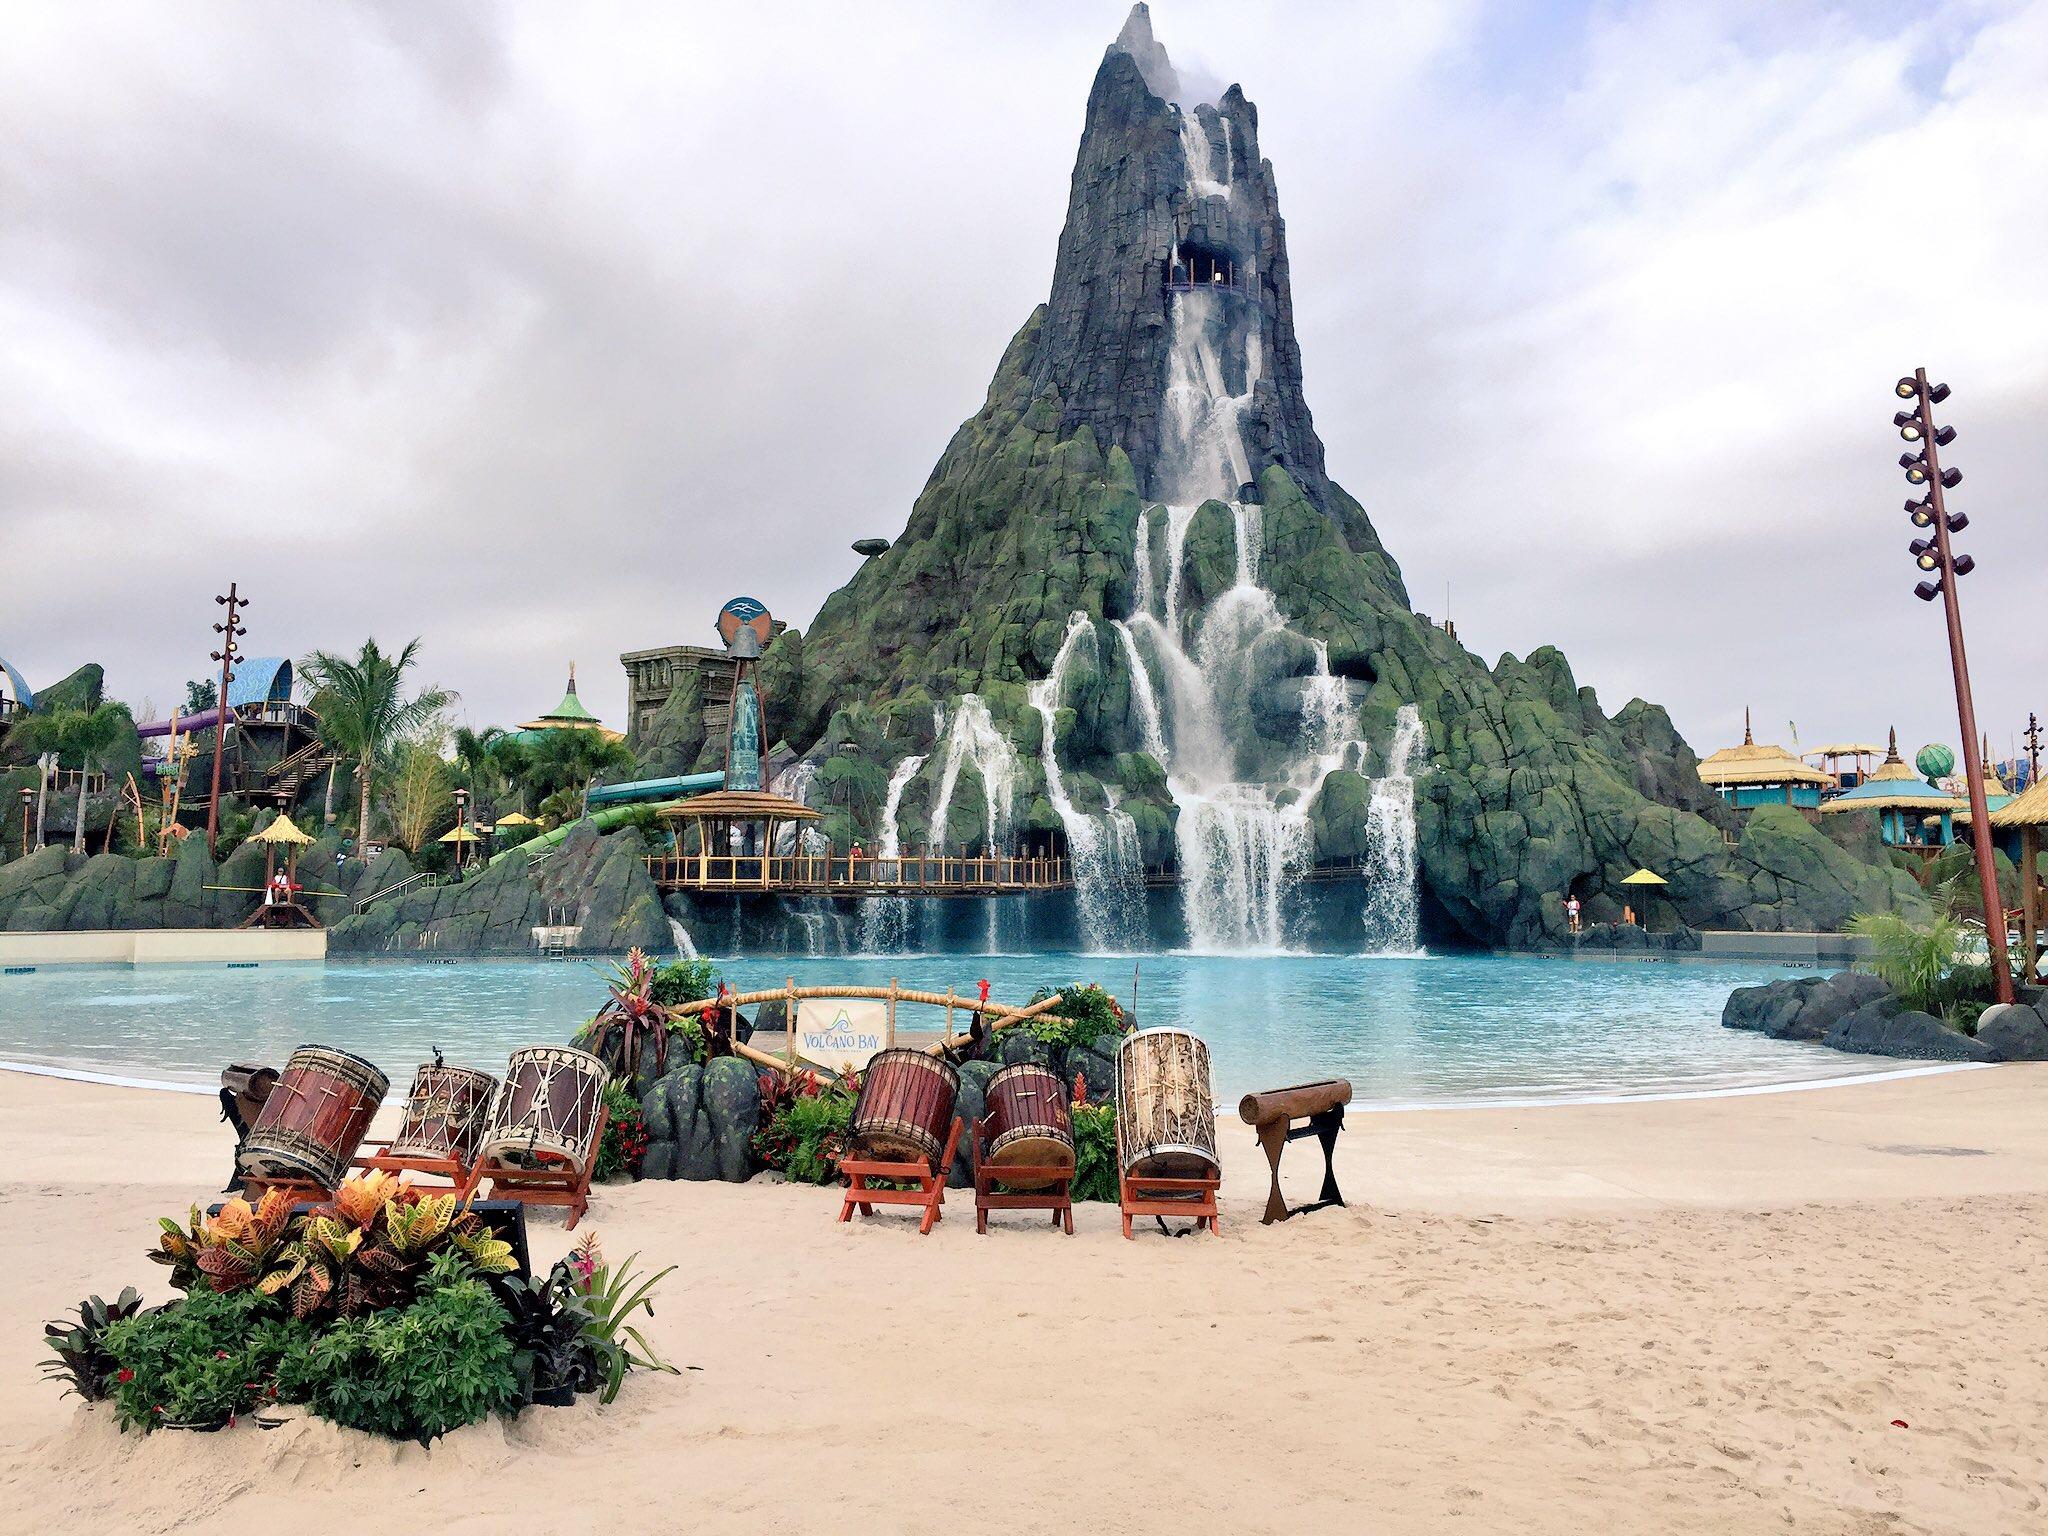 Plan a trip to Universal Orlando Resort Volcano Bay.